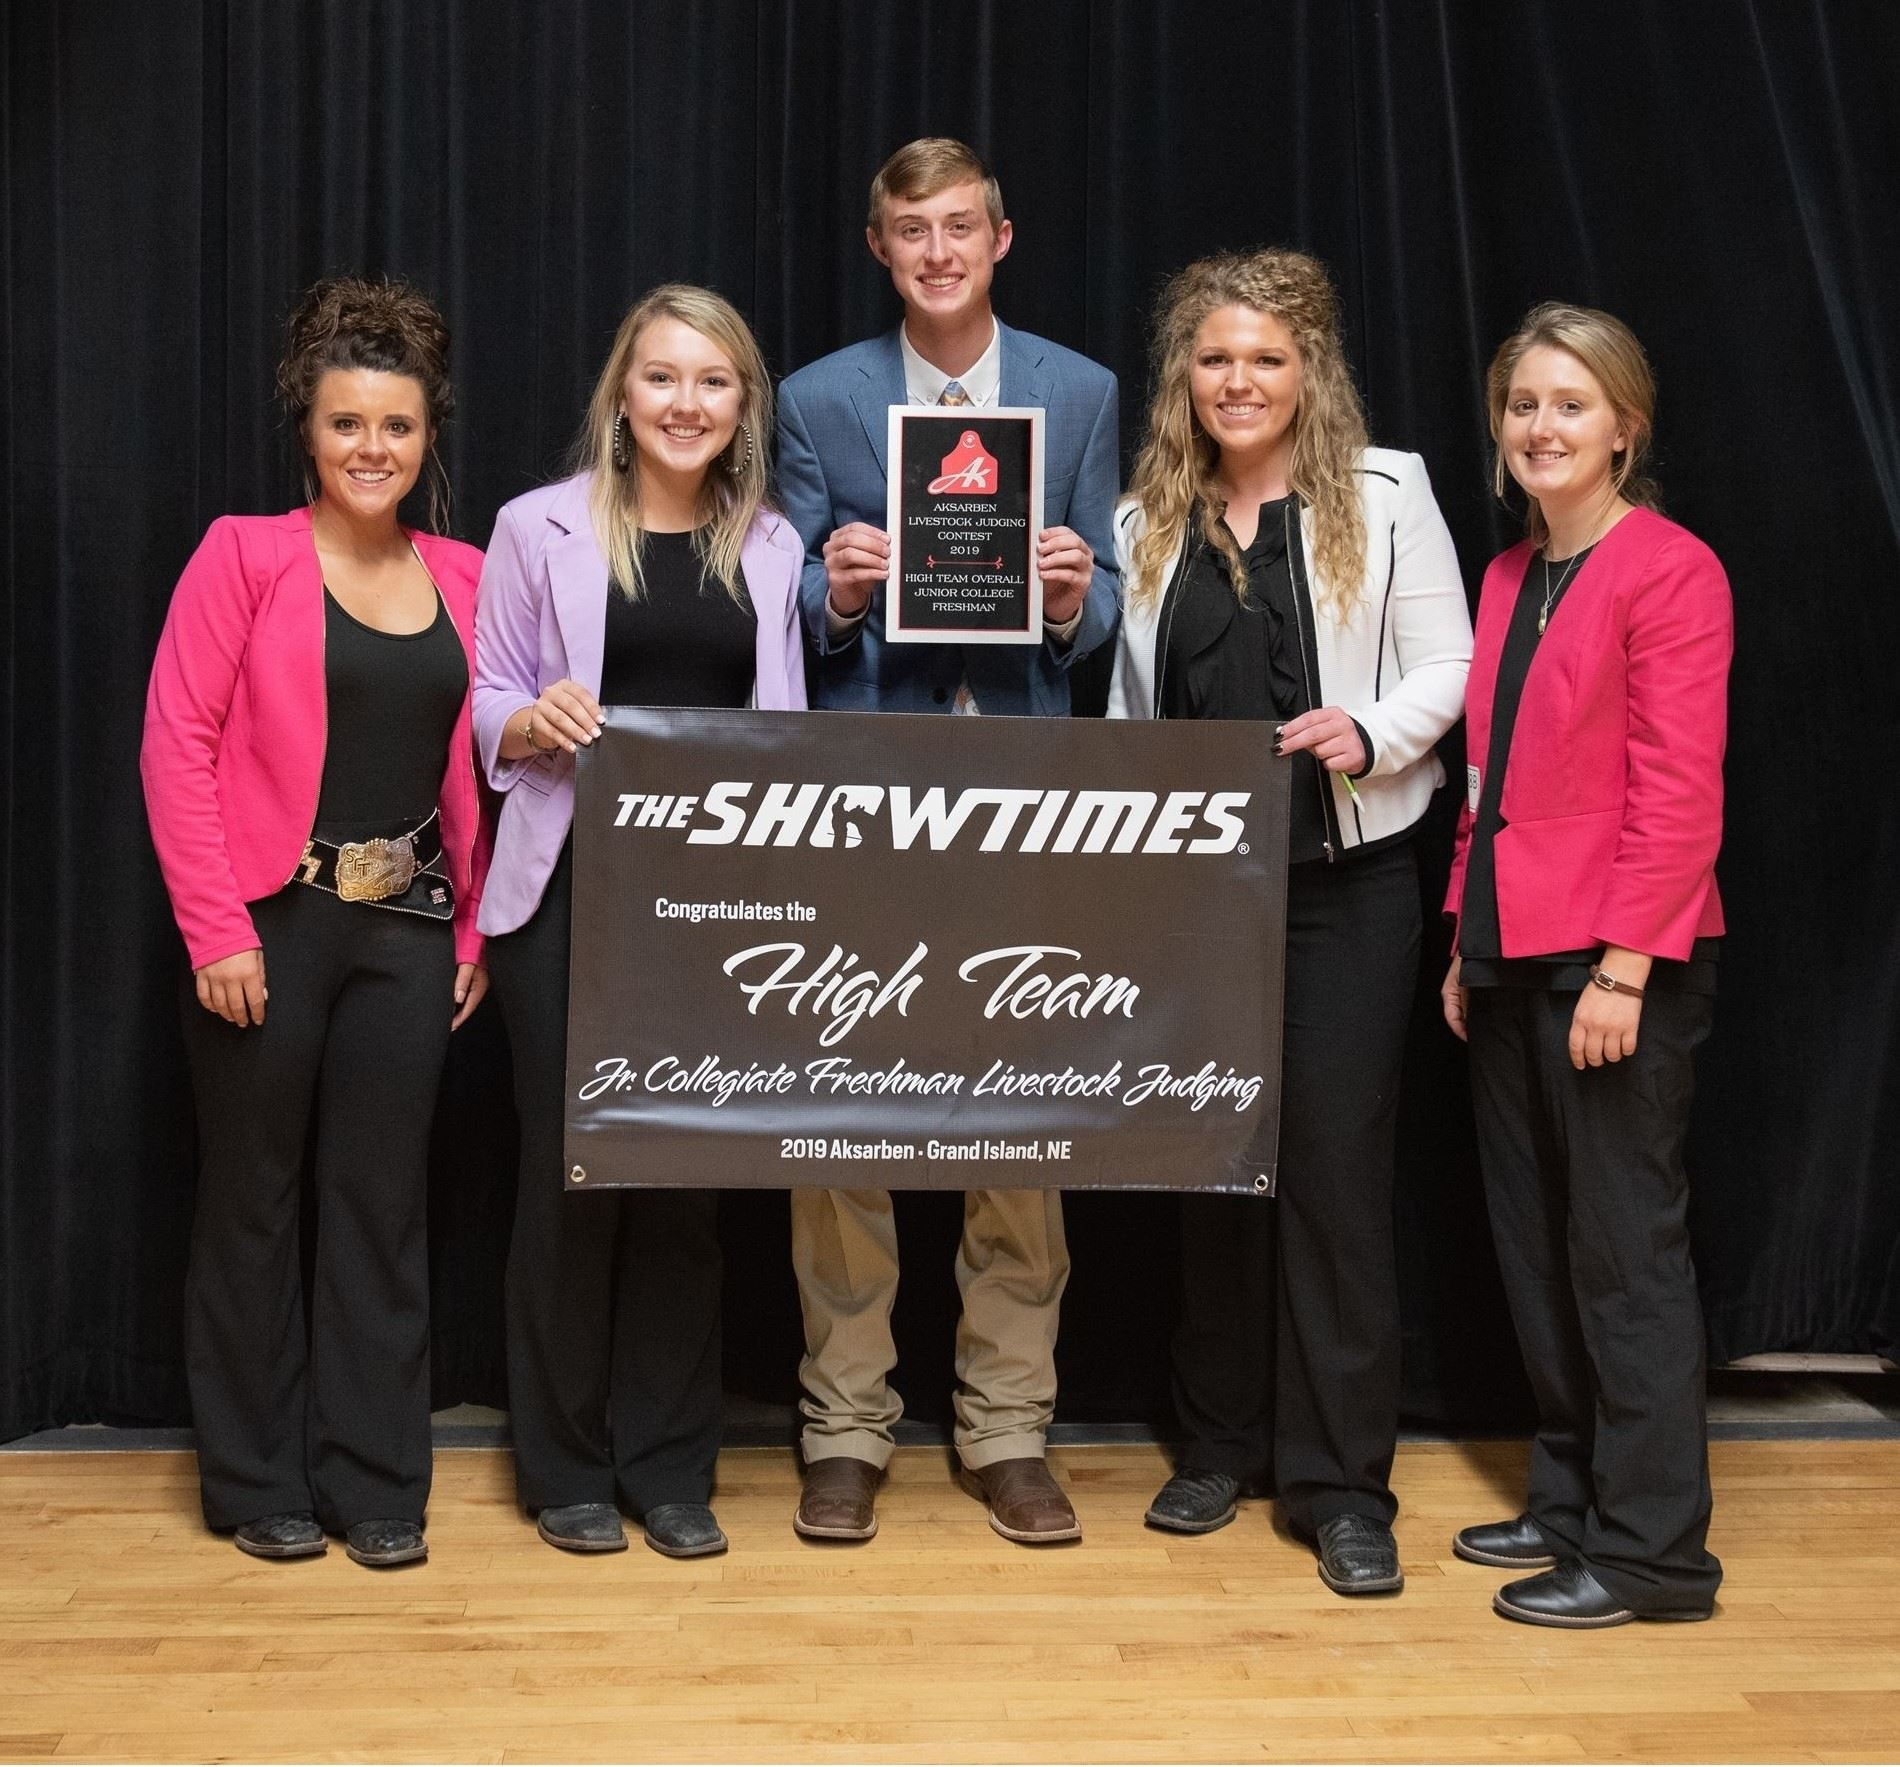 2019 High Team Jr. Collegiate Freshman Livestock Judging